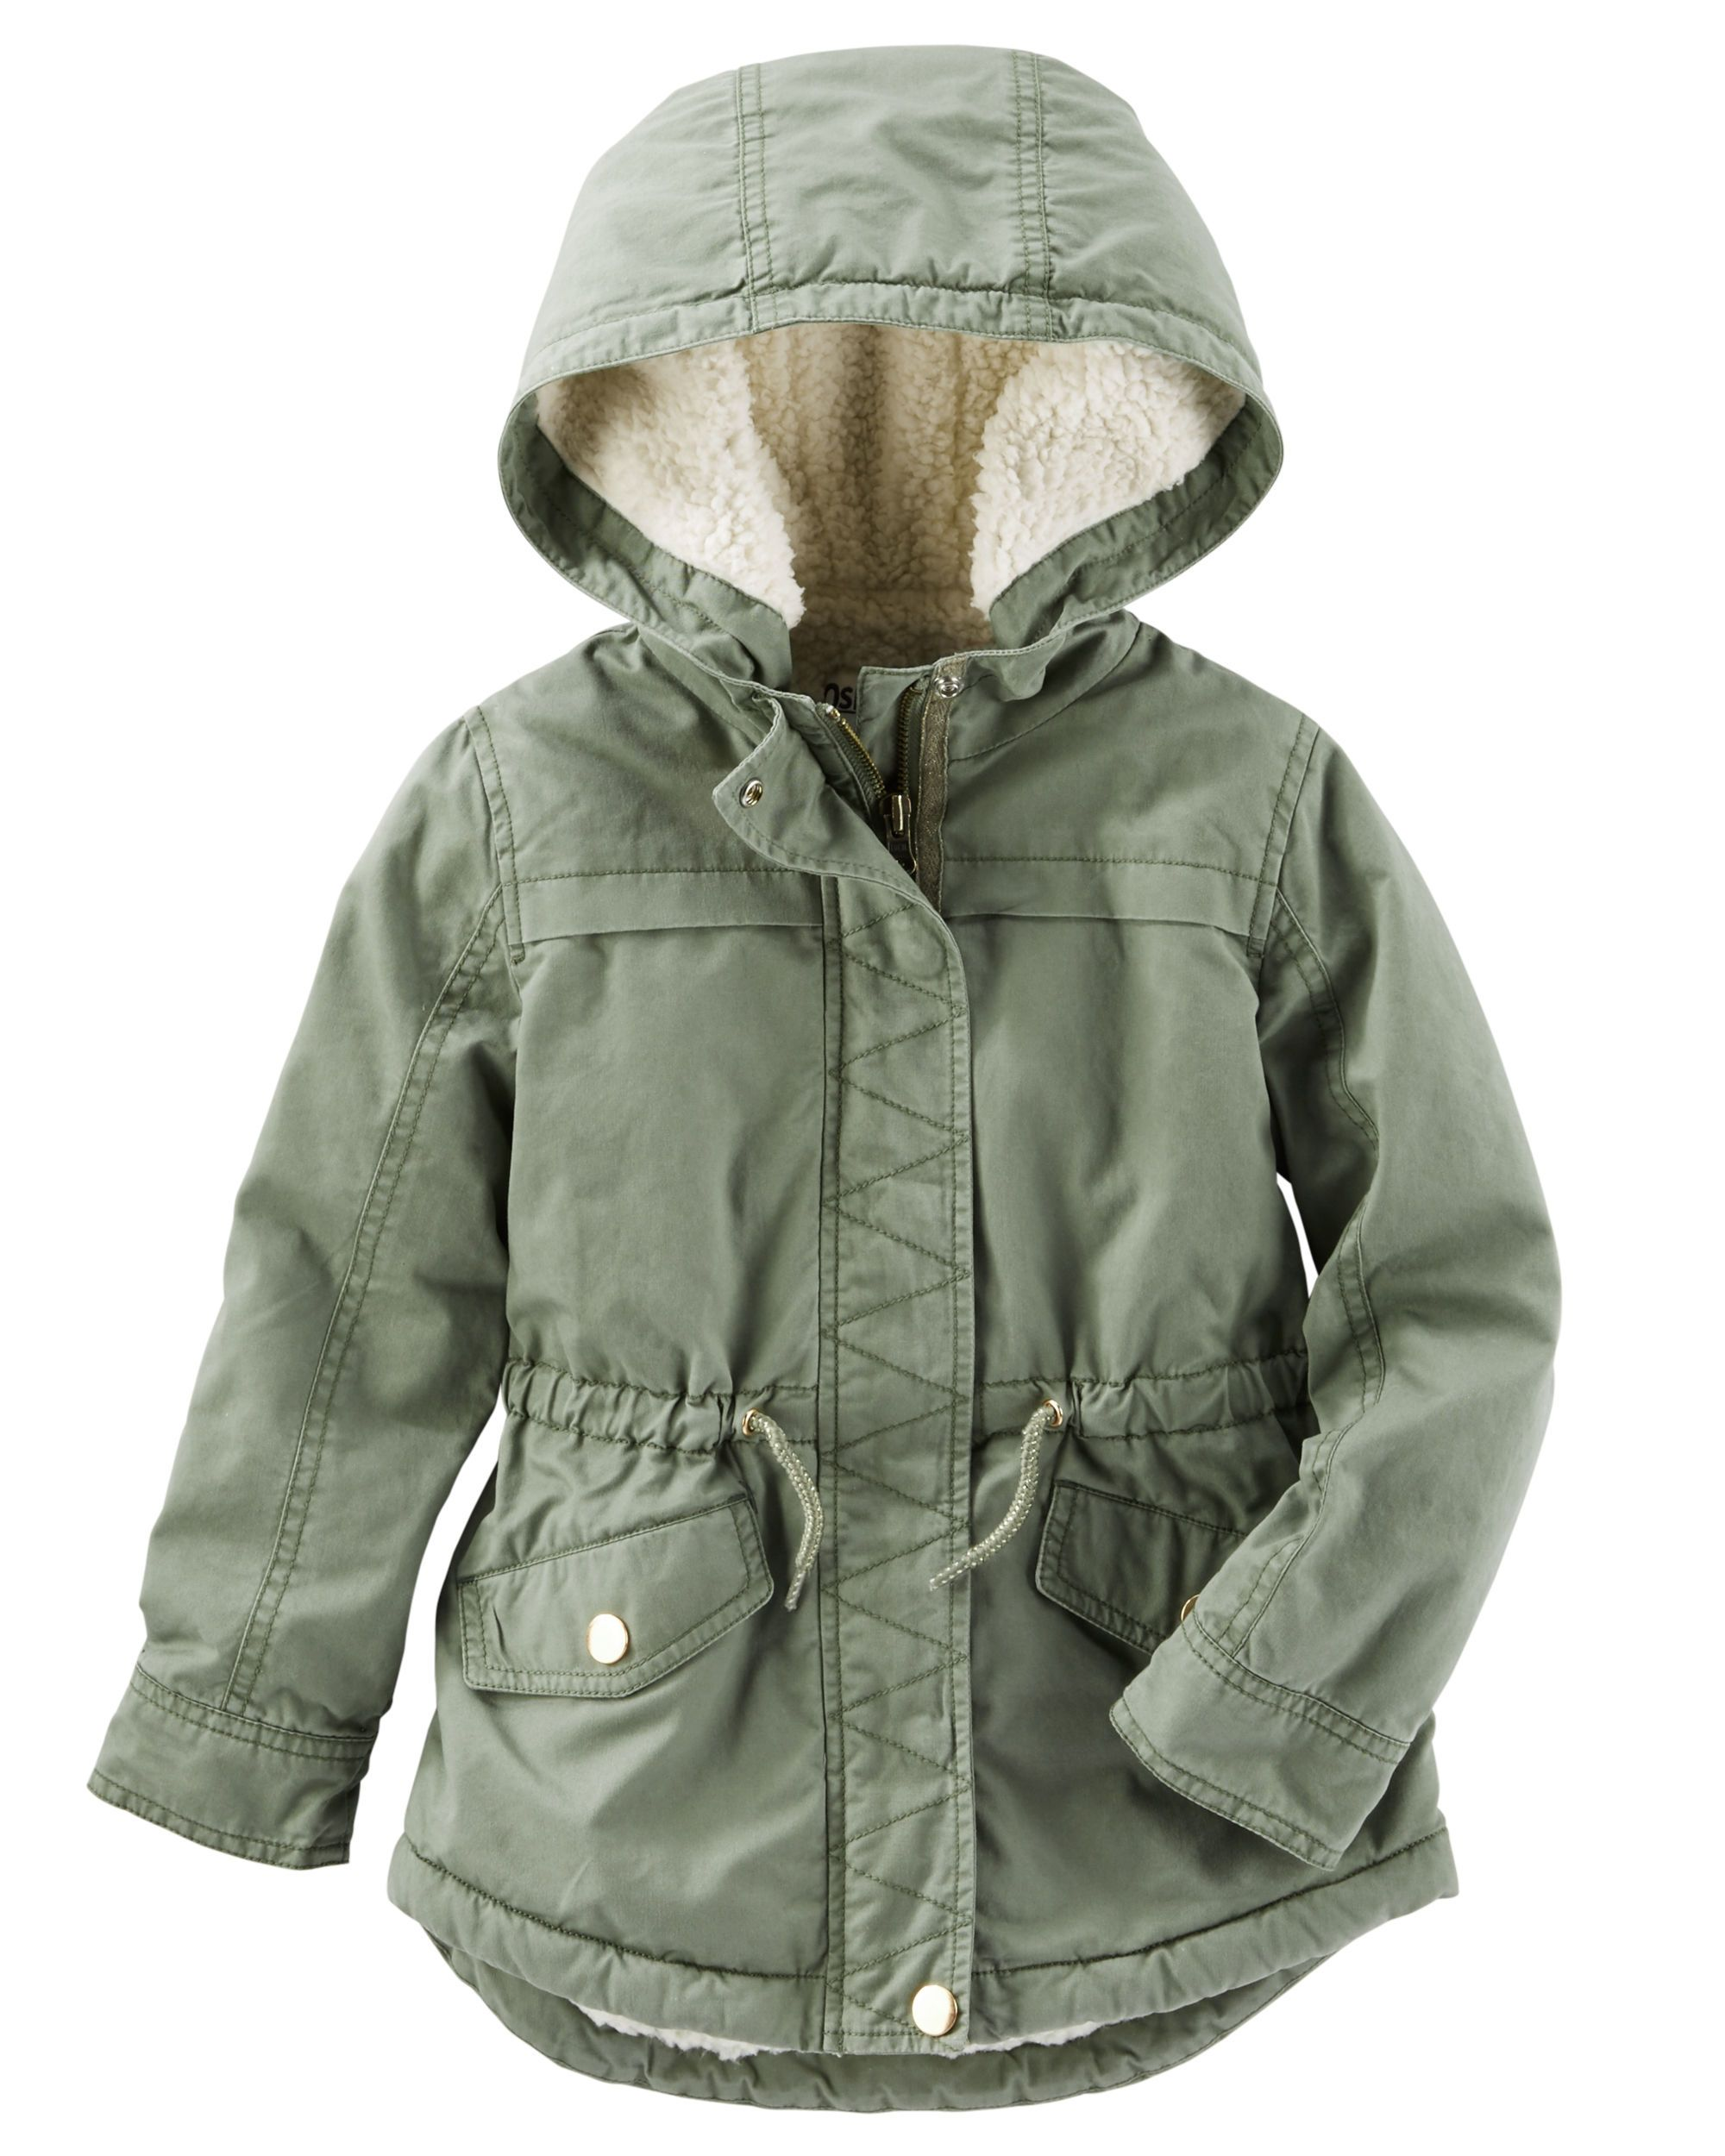 cd639120c55e Kid Girl Sherpa-Lined Parka from OshKosh B gosh. Shop clothing ...